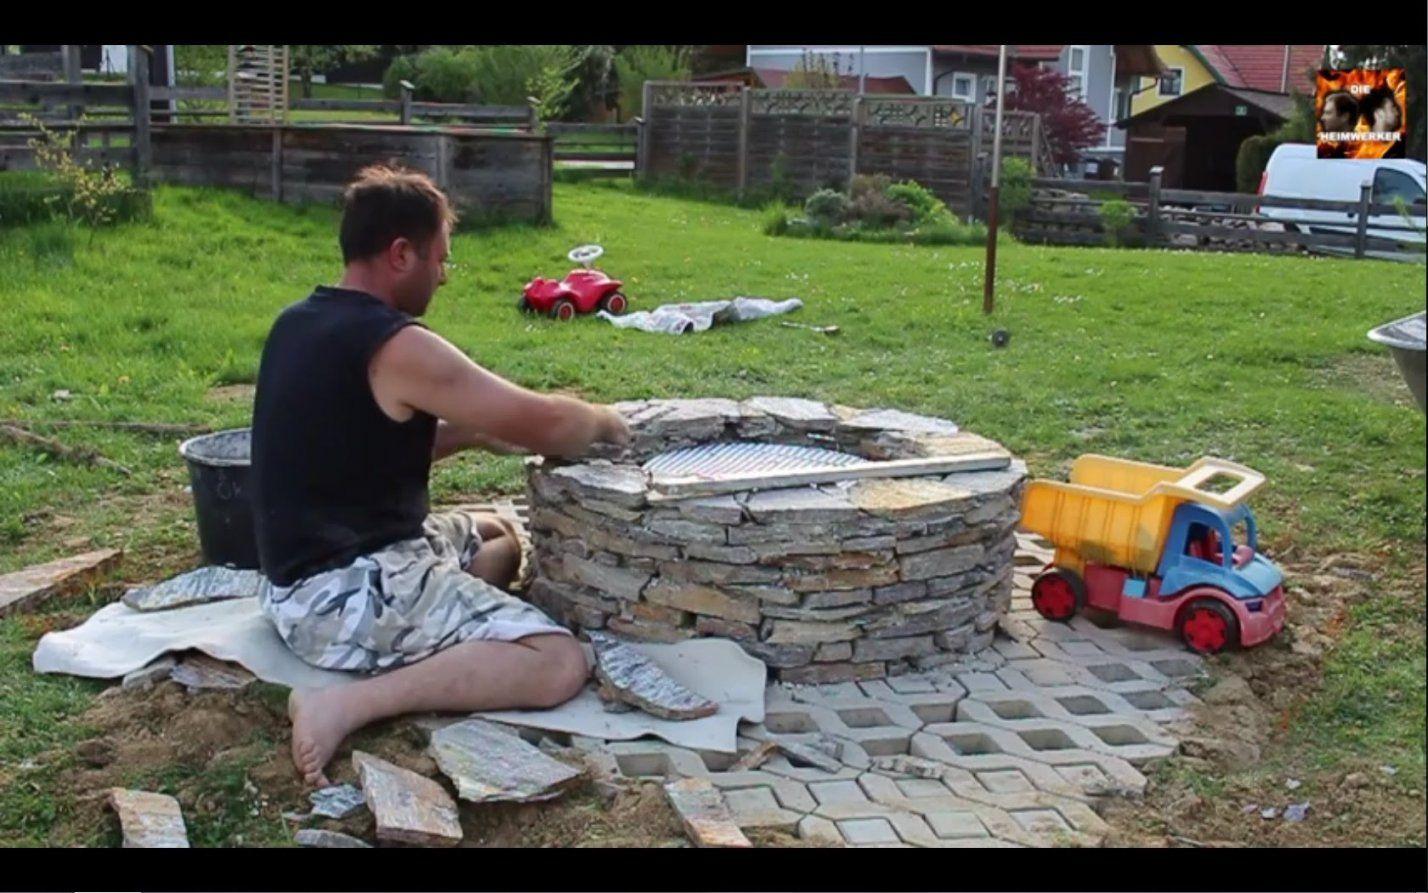 Feuerstelle Im Garten Anlegen – 4 Kreative Ideen Vorgestellt von Feuerstelle Im Garten Bilder Photo